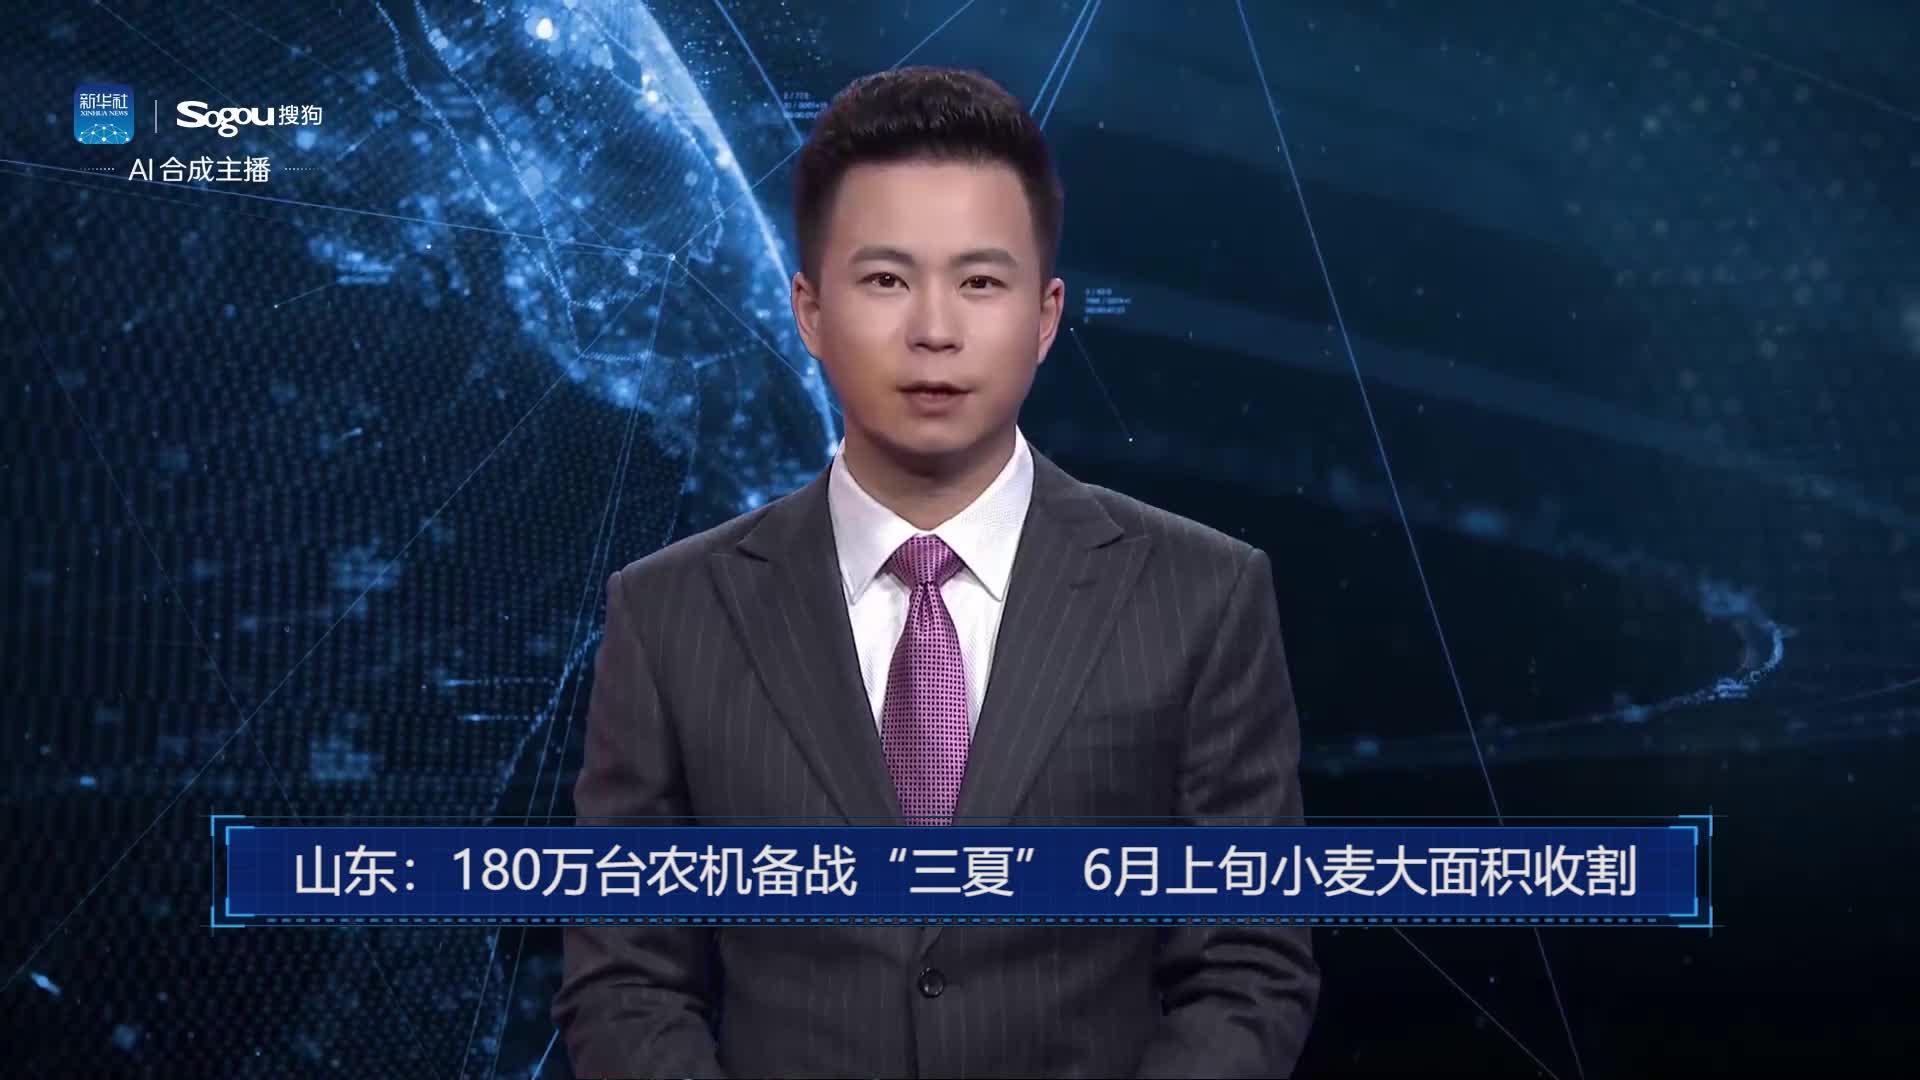 "AI合成主播丨山东:180万台农机备战""三夏"" 6月上旬小麦大面积收割安卓版"